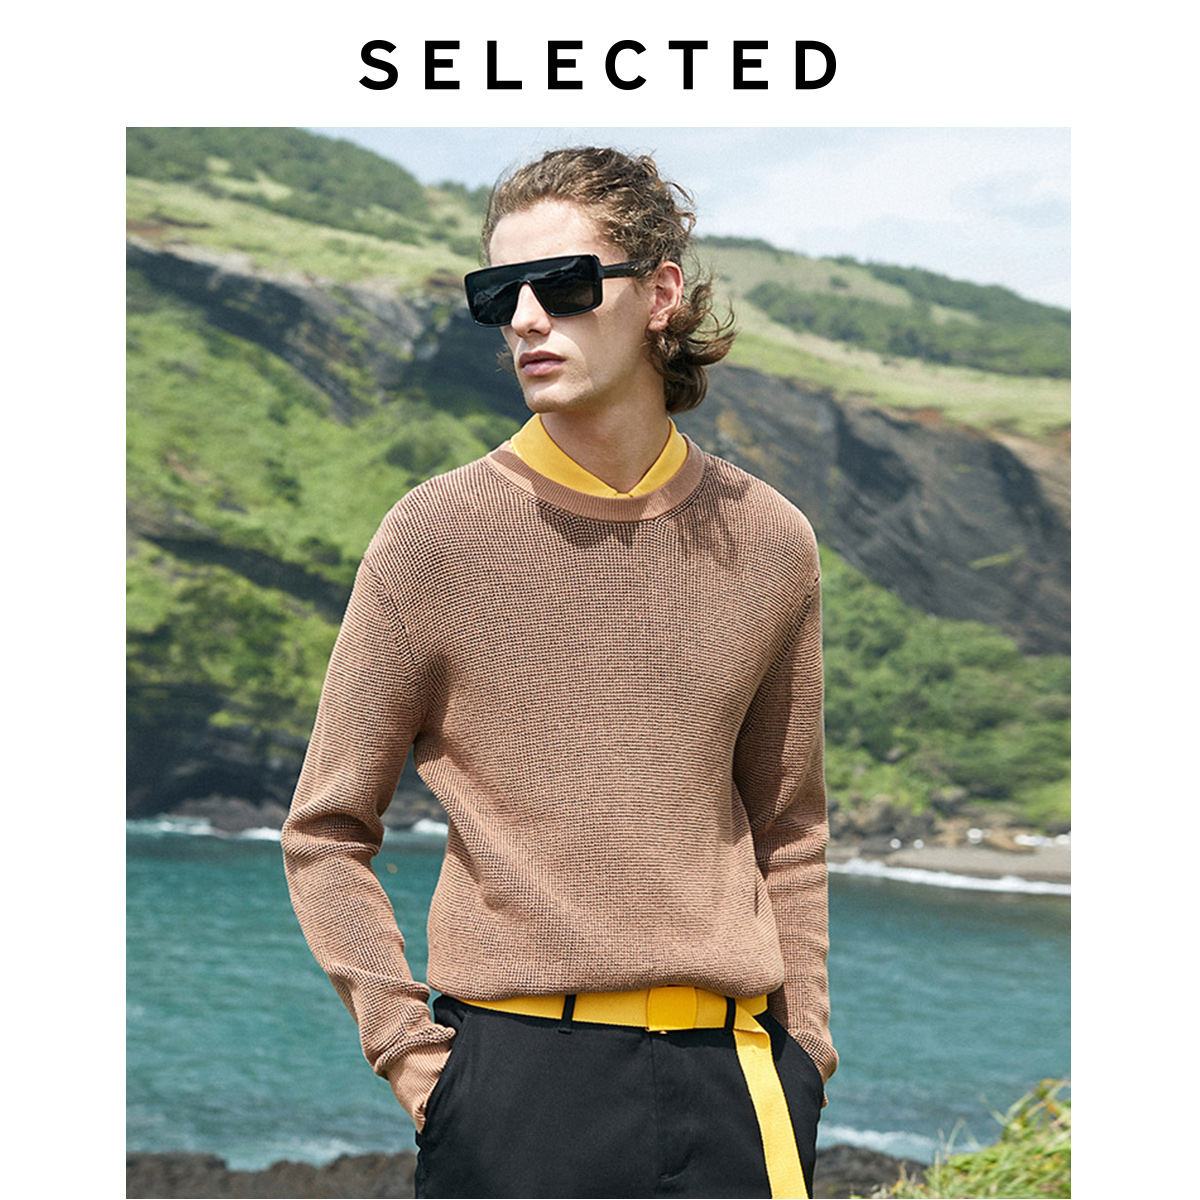 SELECTED Men's Autumn & Winter 100% Cotton Round Neckline Knit LAB|419425506